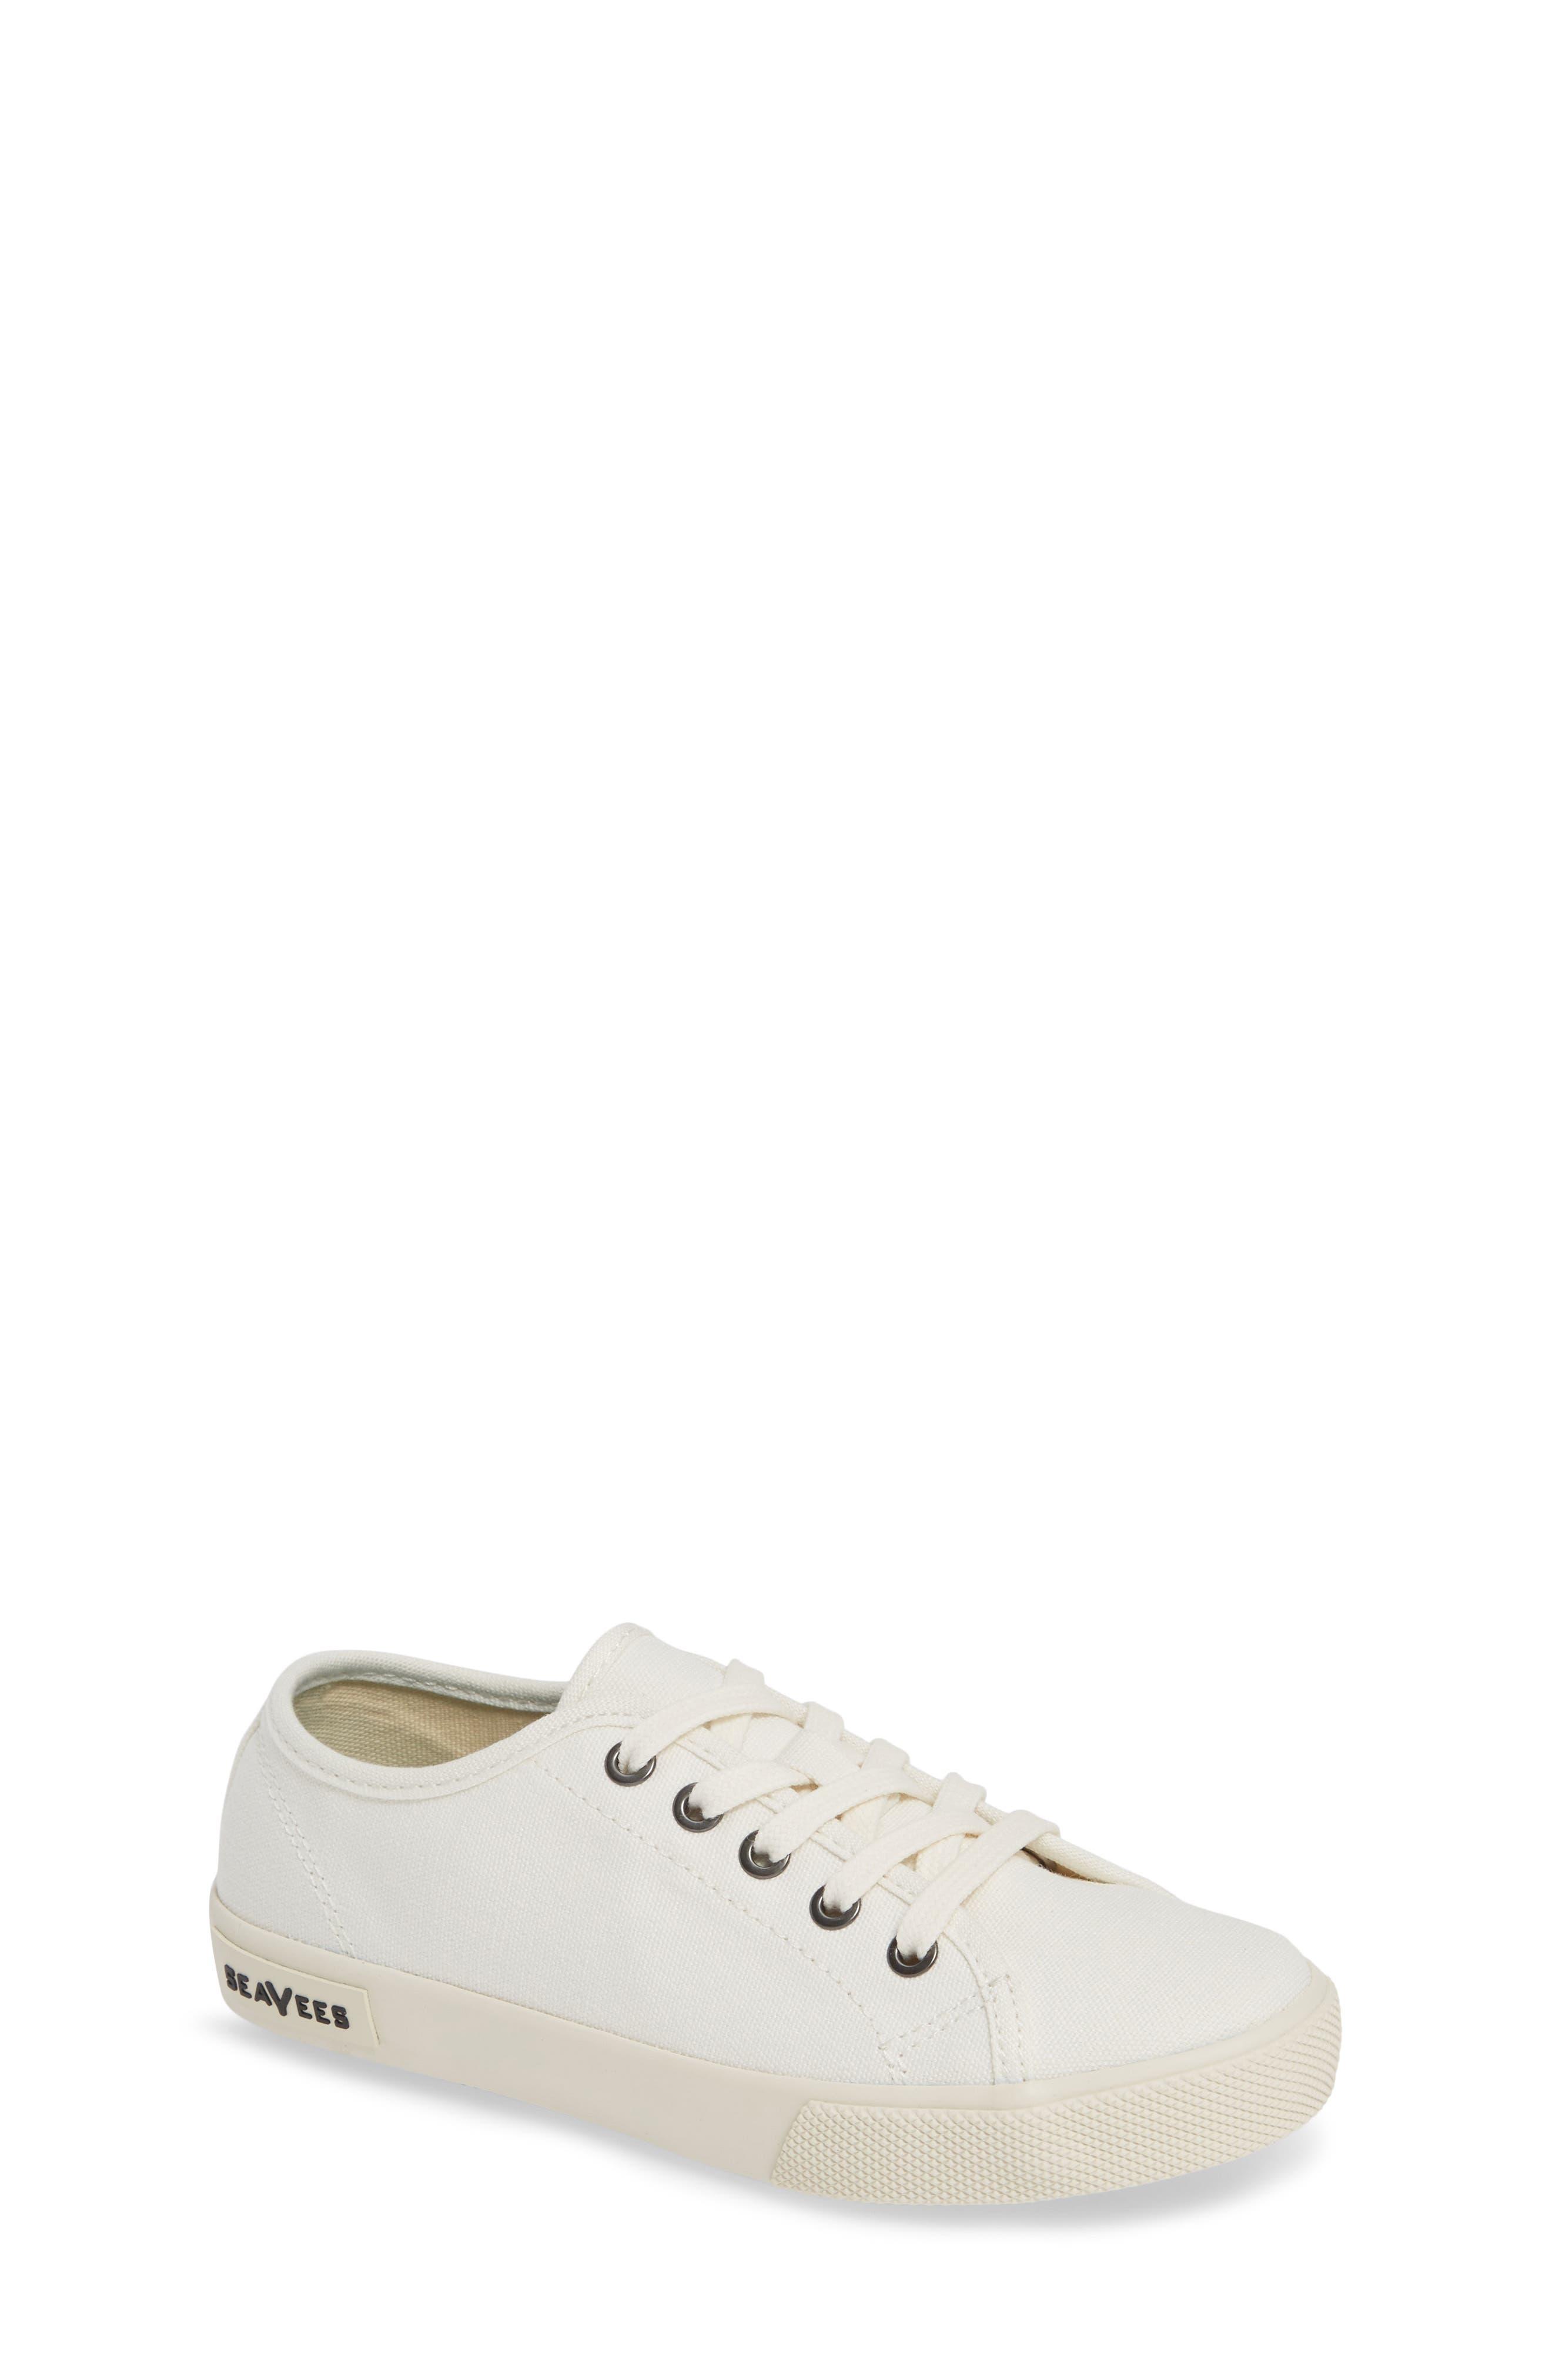 Kids Seavees Monterey Standard Sneaker Size 4 M  White